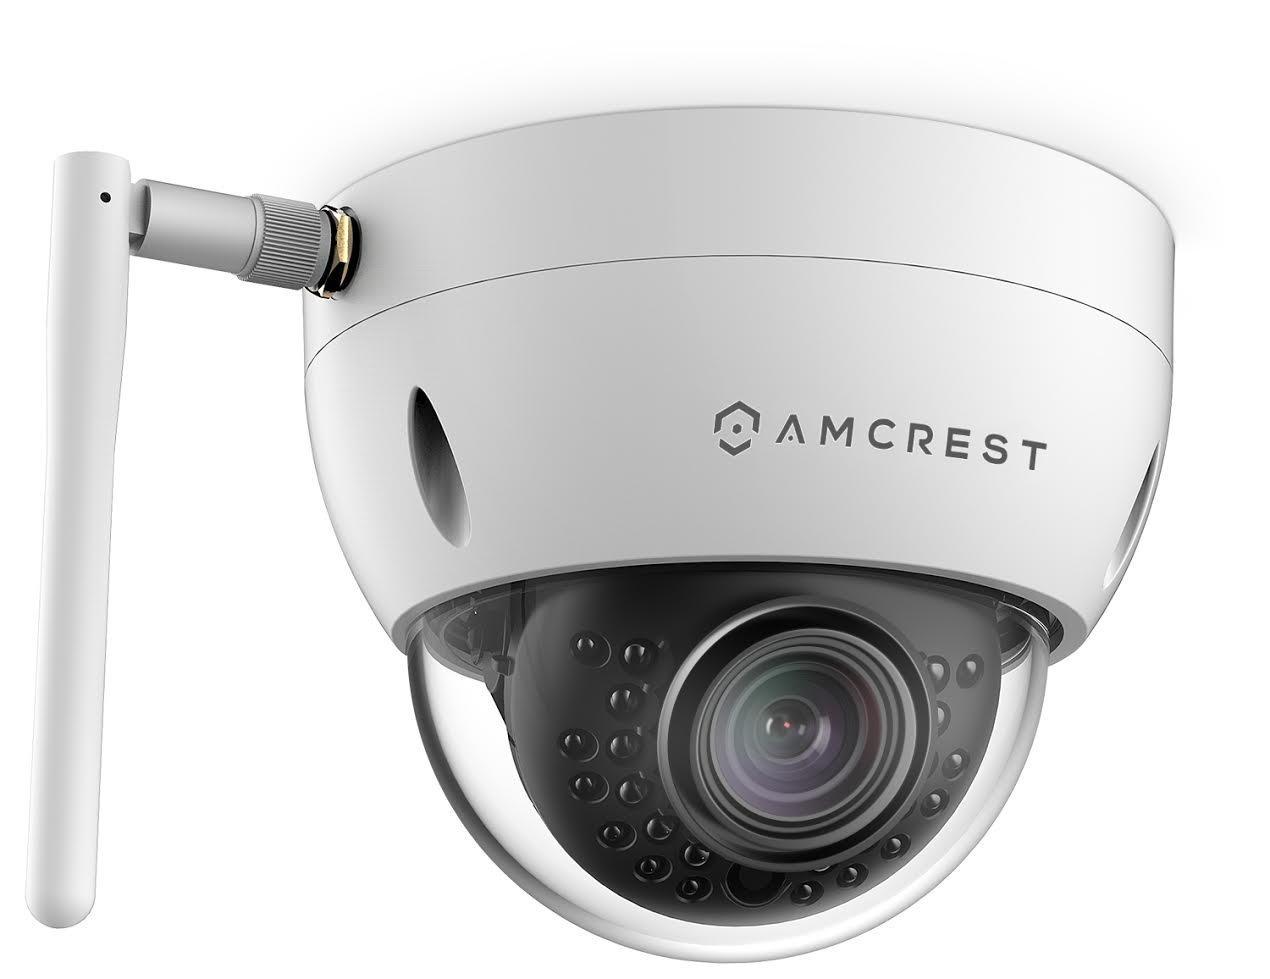 Amcrest ProHD Fixed Outdoor 3-Megapixel 2304 x 1296P Wi-Fi Vandal Dome IP Security Camera – IP67 Weatherproof, IK10 Vandal-Proof, 3MP 1080P 1296P , IP3M-956W White Renewed